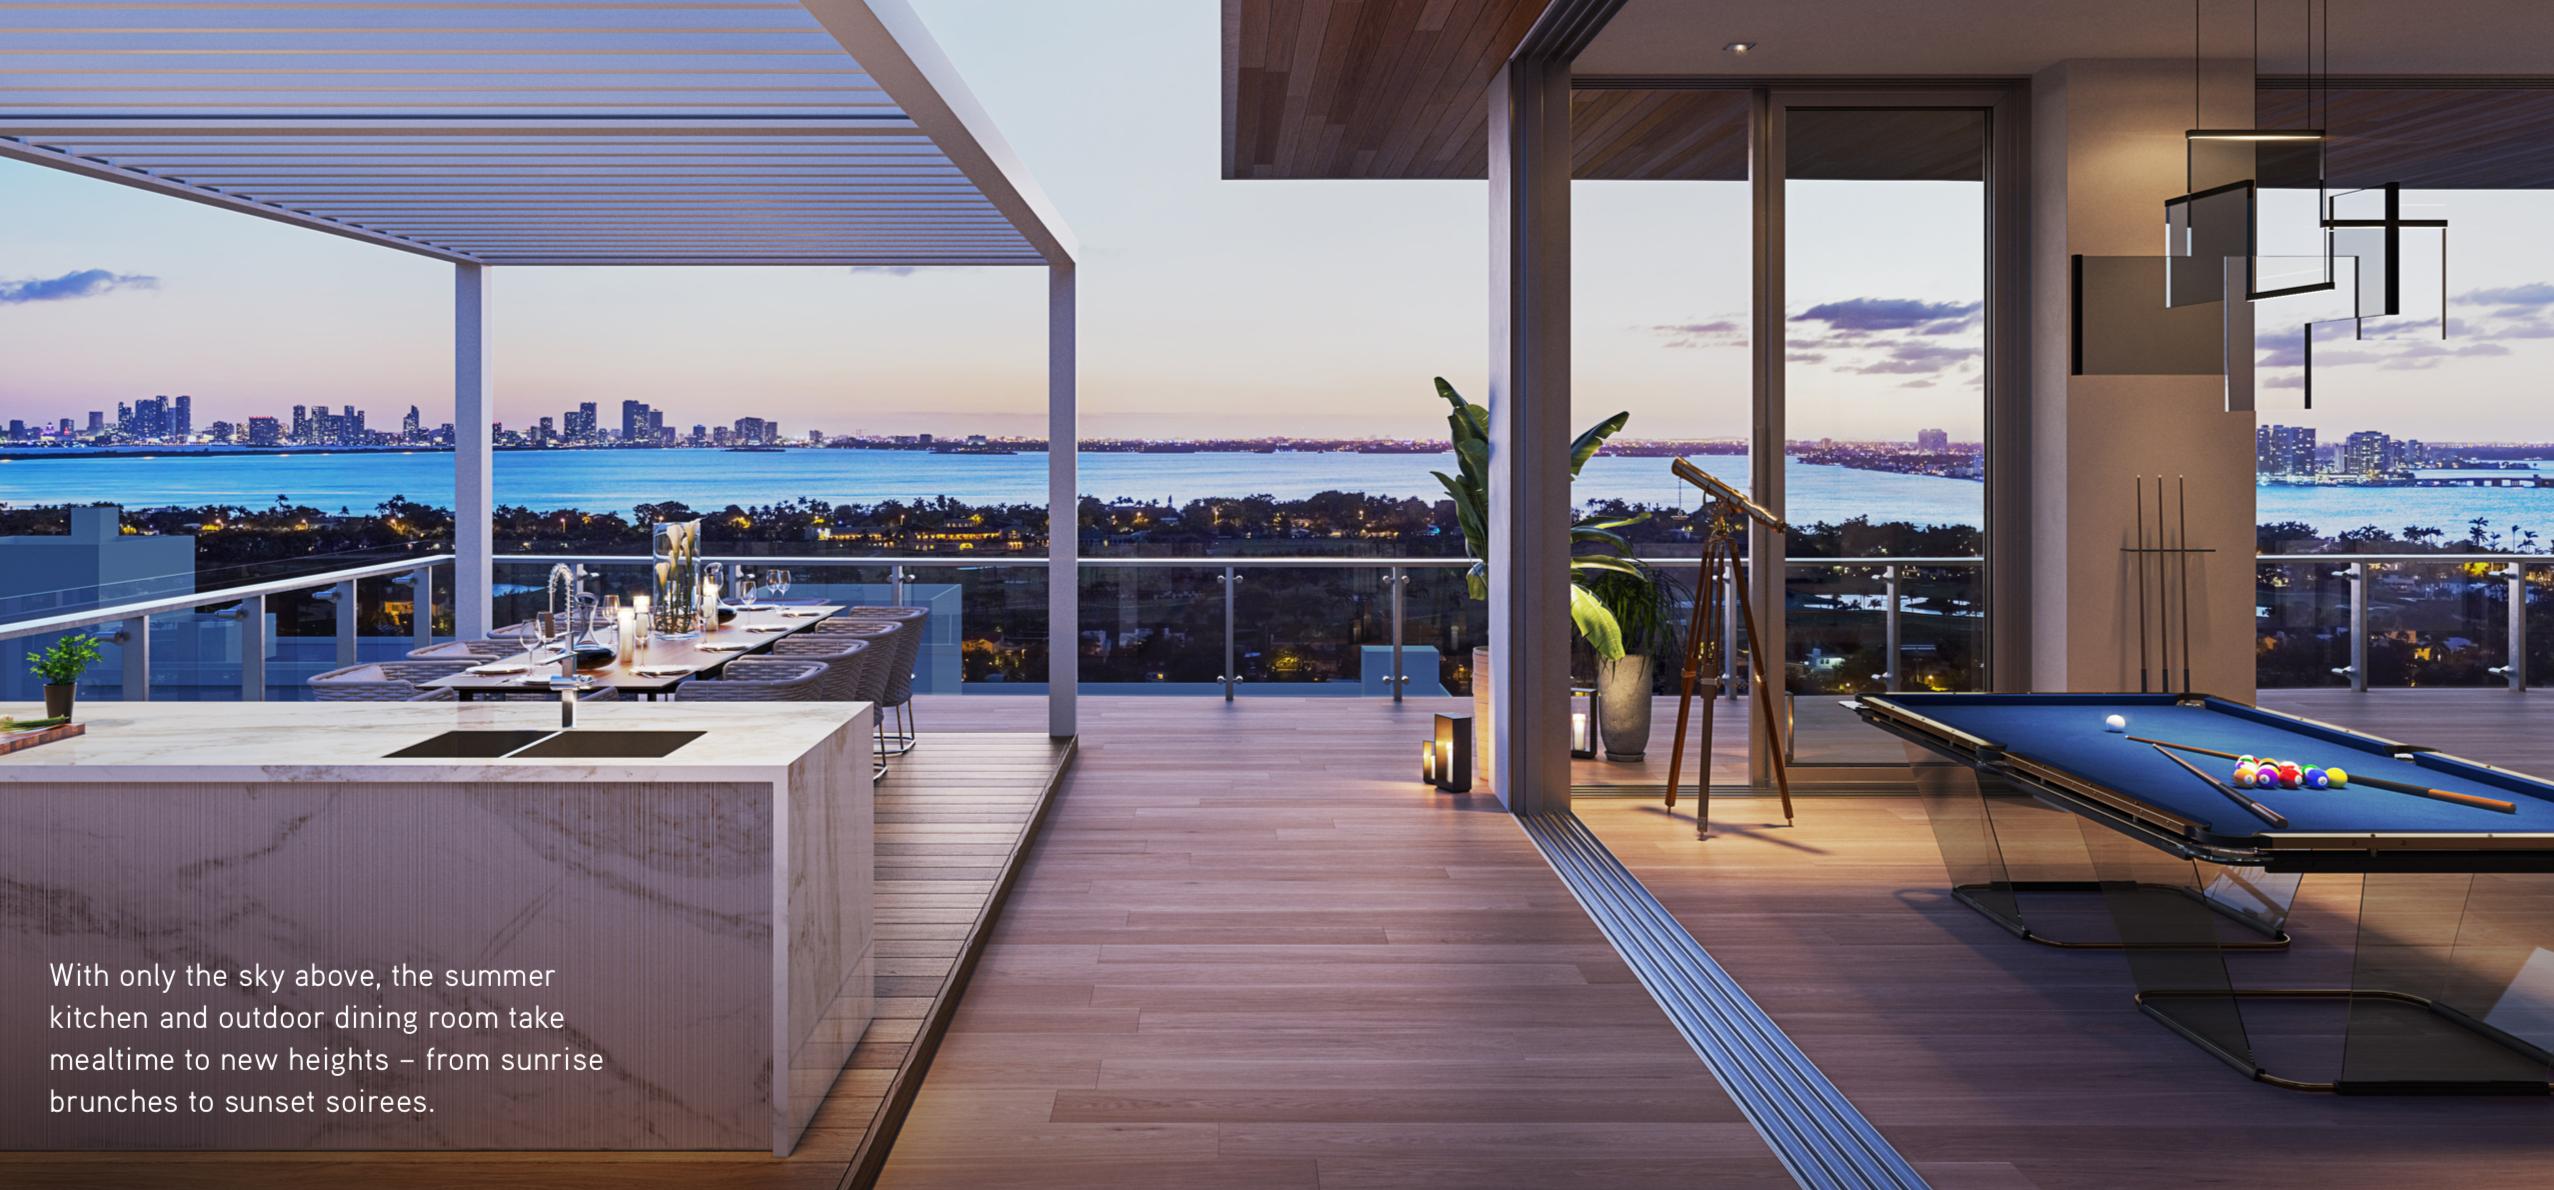 The 57 Ocean penthouse